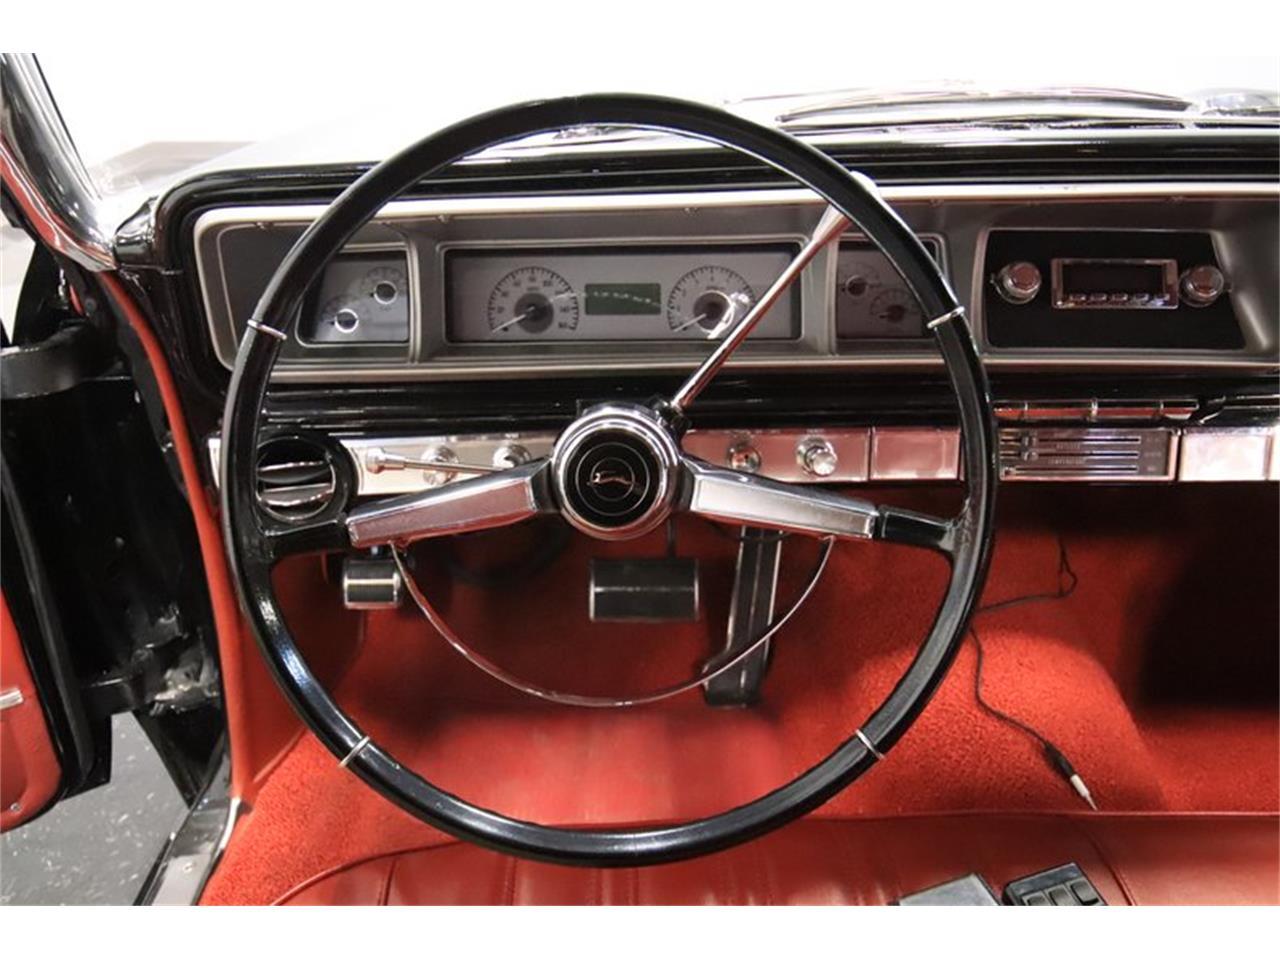 Large Picture of Classic '66 Impala located in Arizona - $52,995.00 - Q2EF